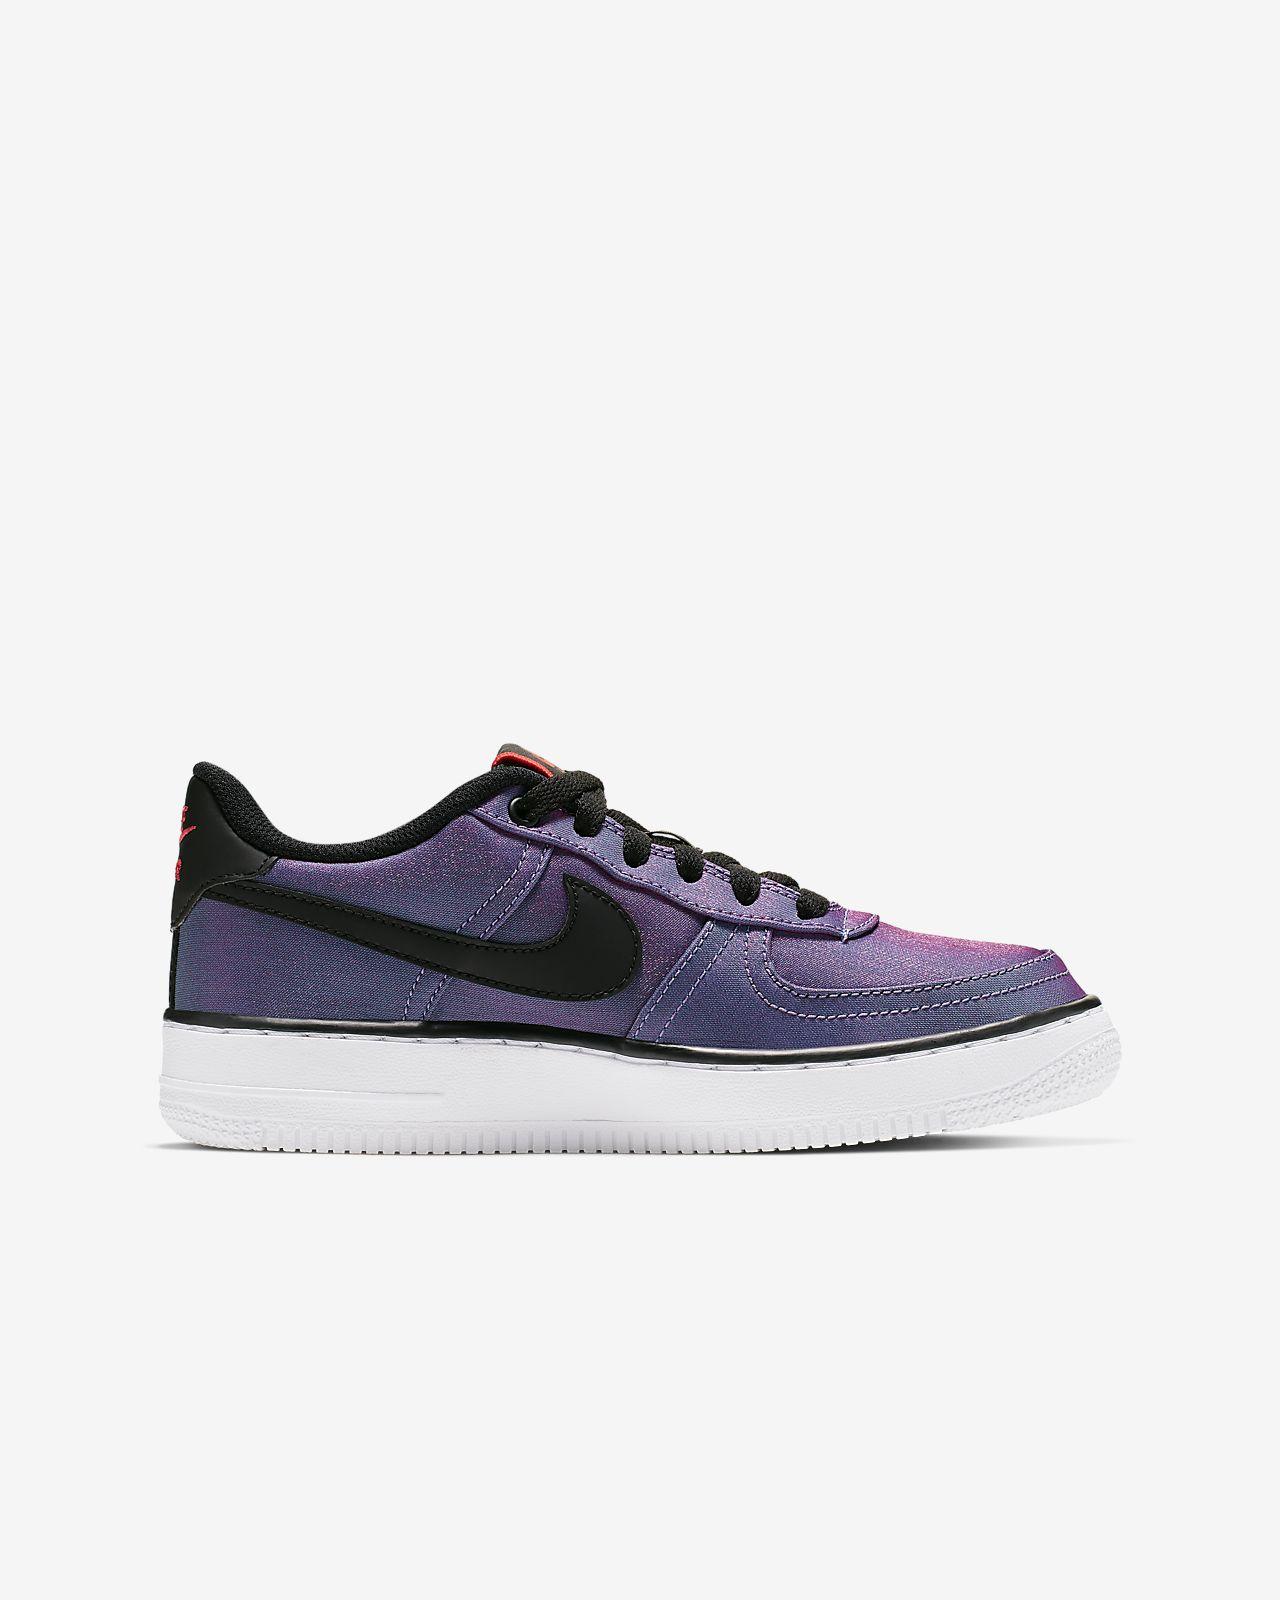 d5d6aa3c228e5 Nike Air Force 1 LV8 Shift Older Kids' Shoe. Nike.com AU